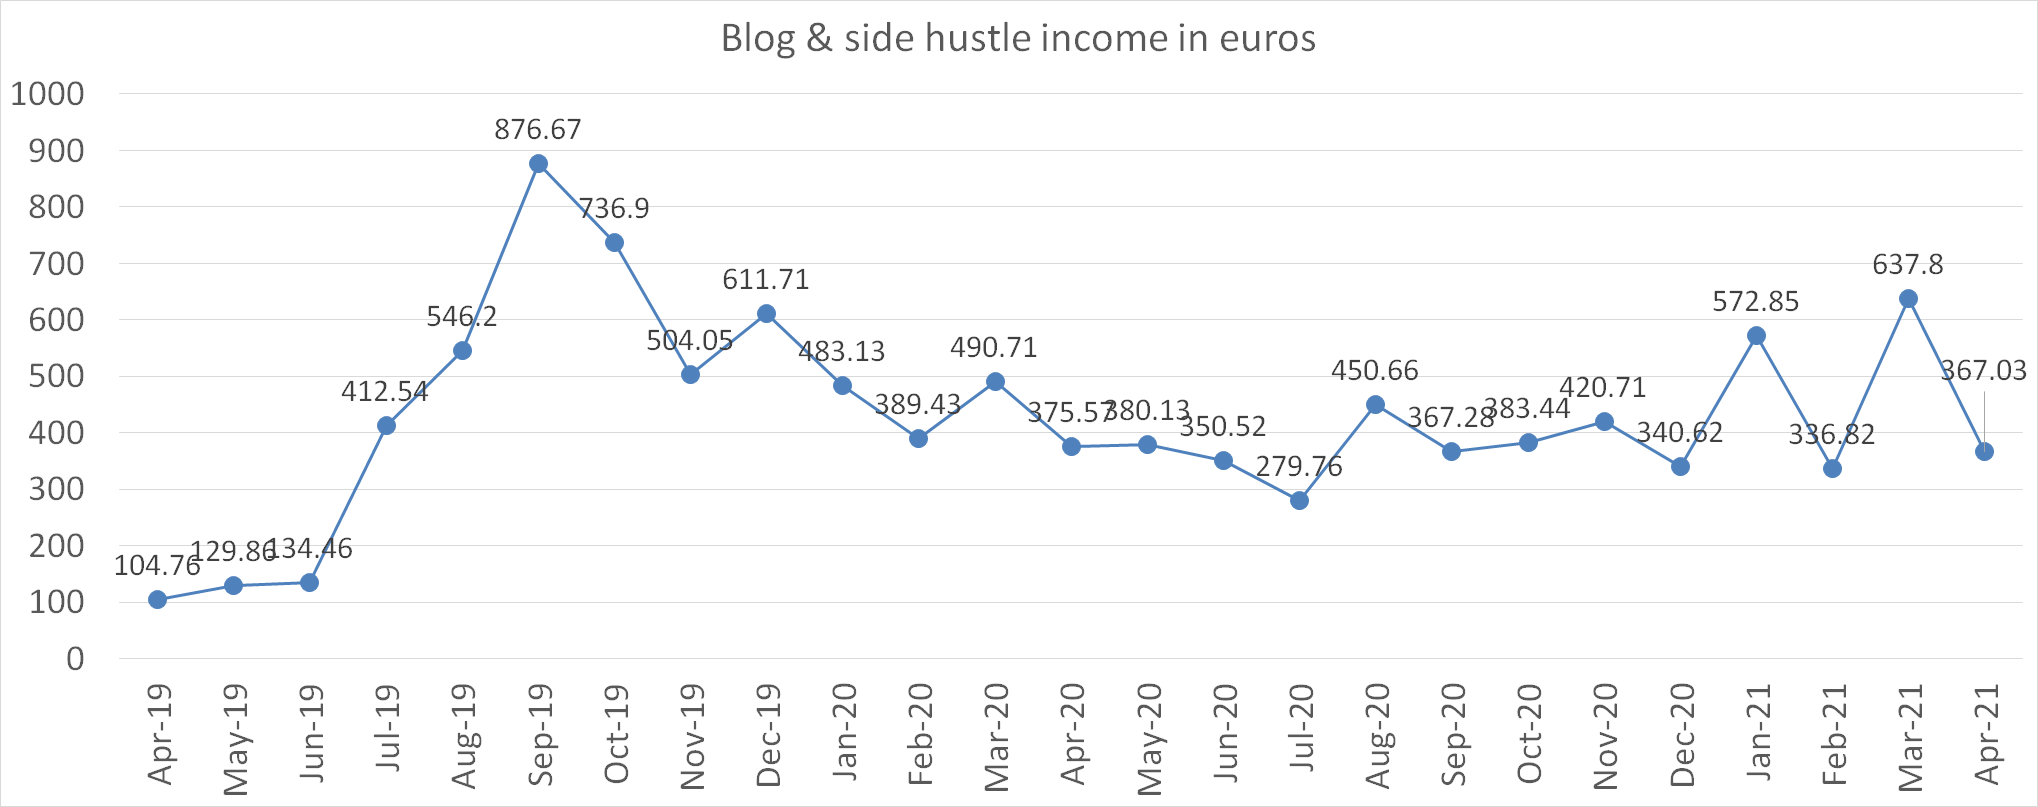 Financefreedom.eu blog and side hustle income in euros april 2021